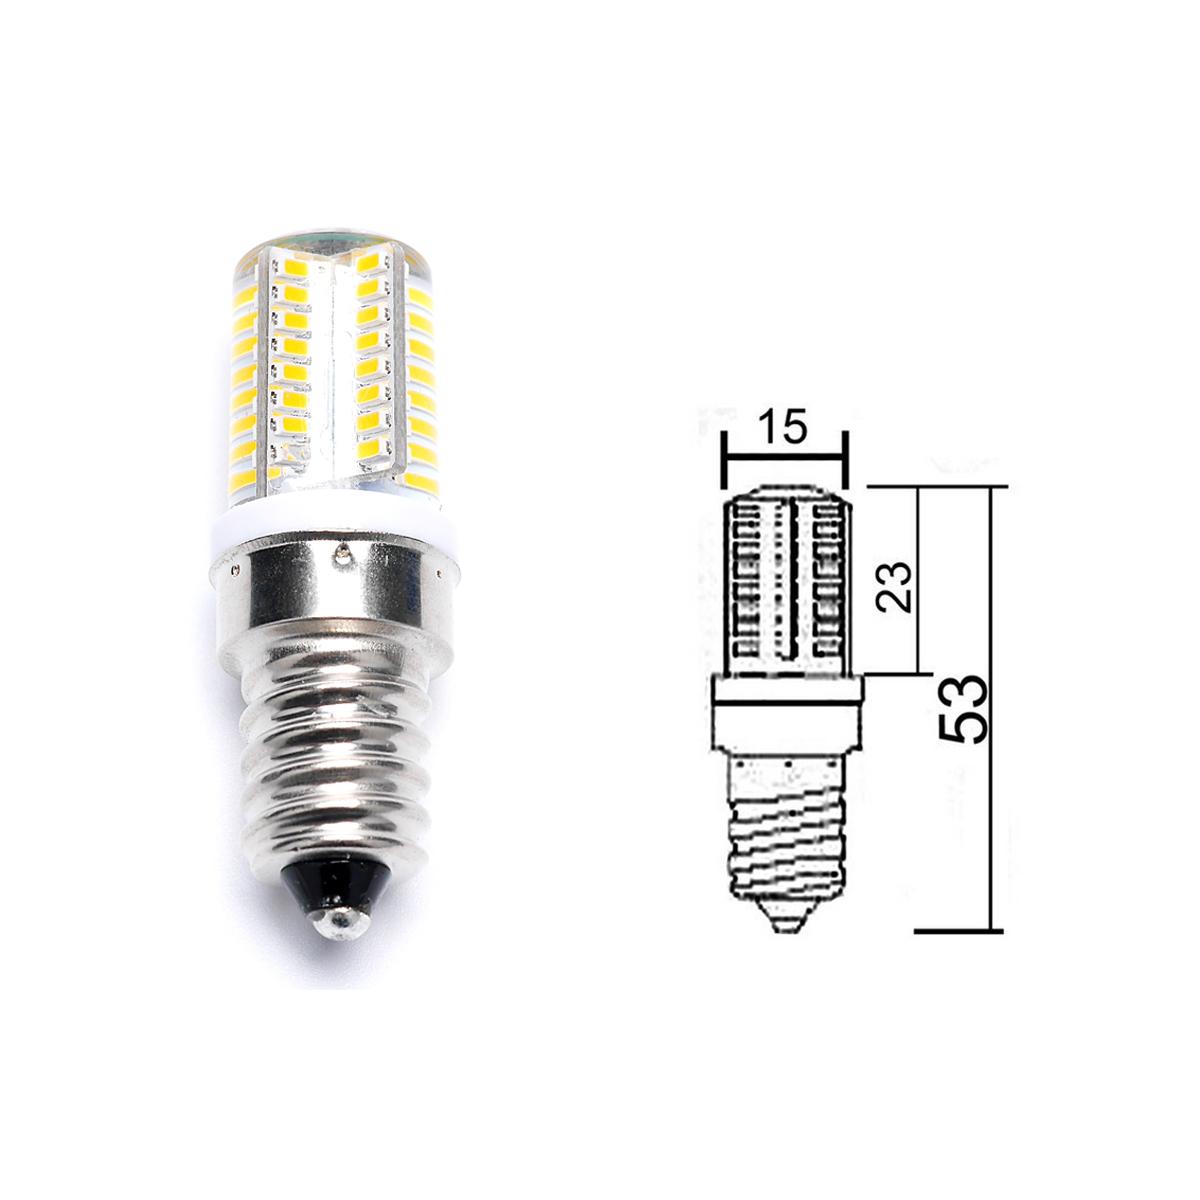 E14 3W 64 LED SMD Capsule Bulbs Corn Bulb Light Replace ...